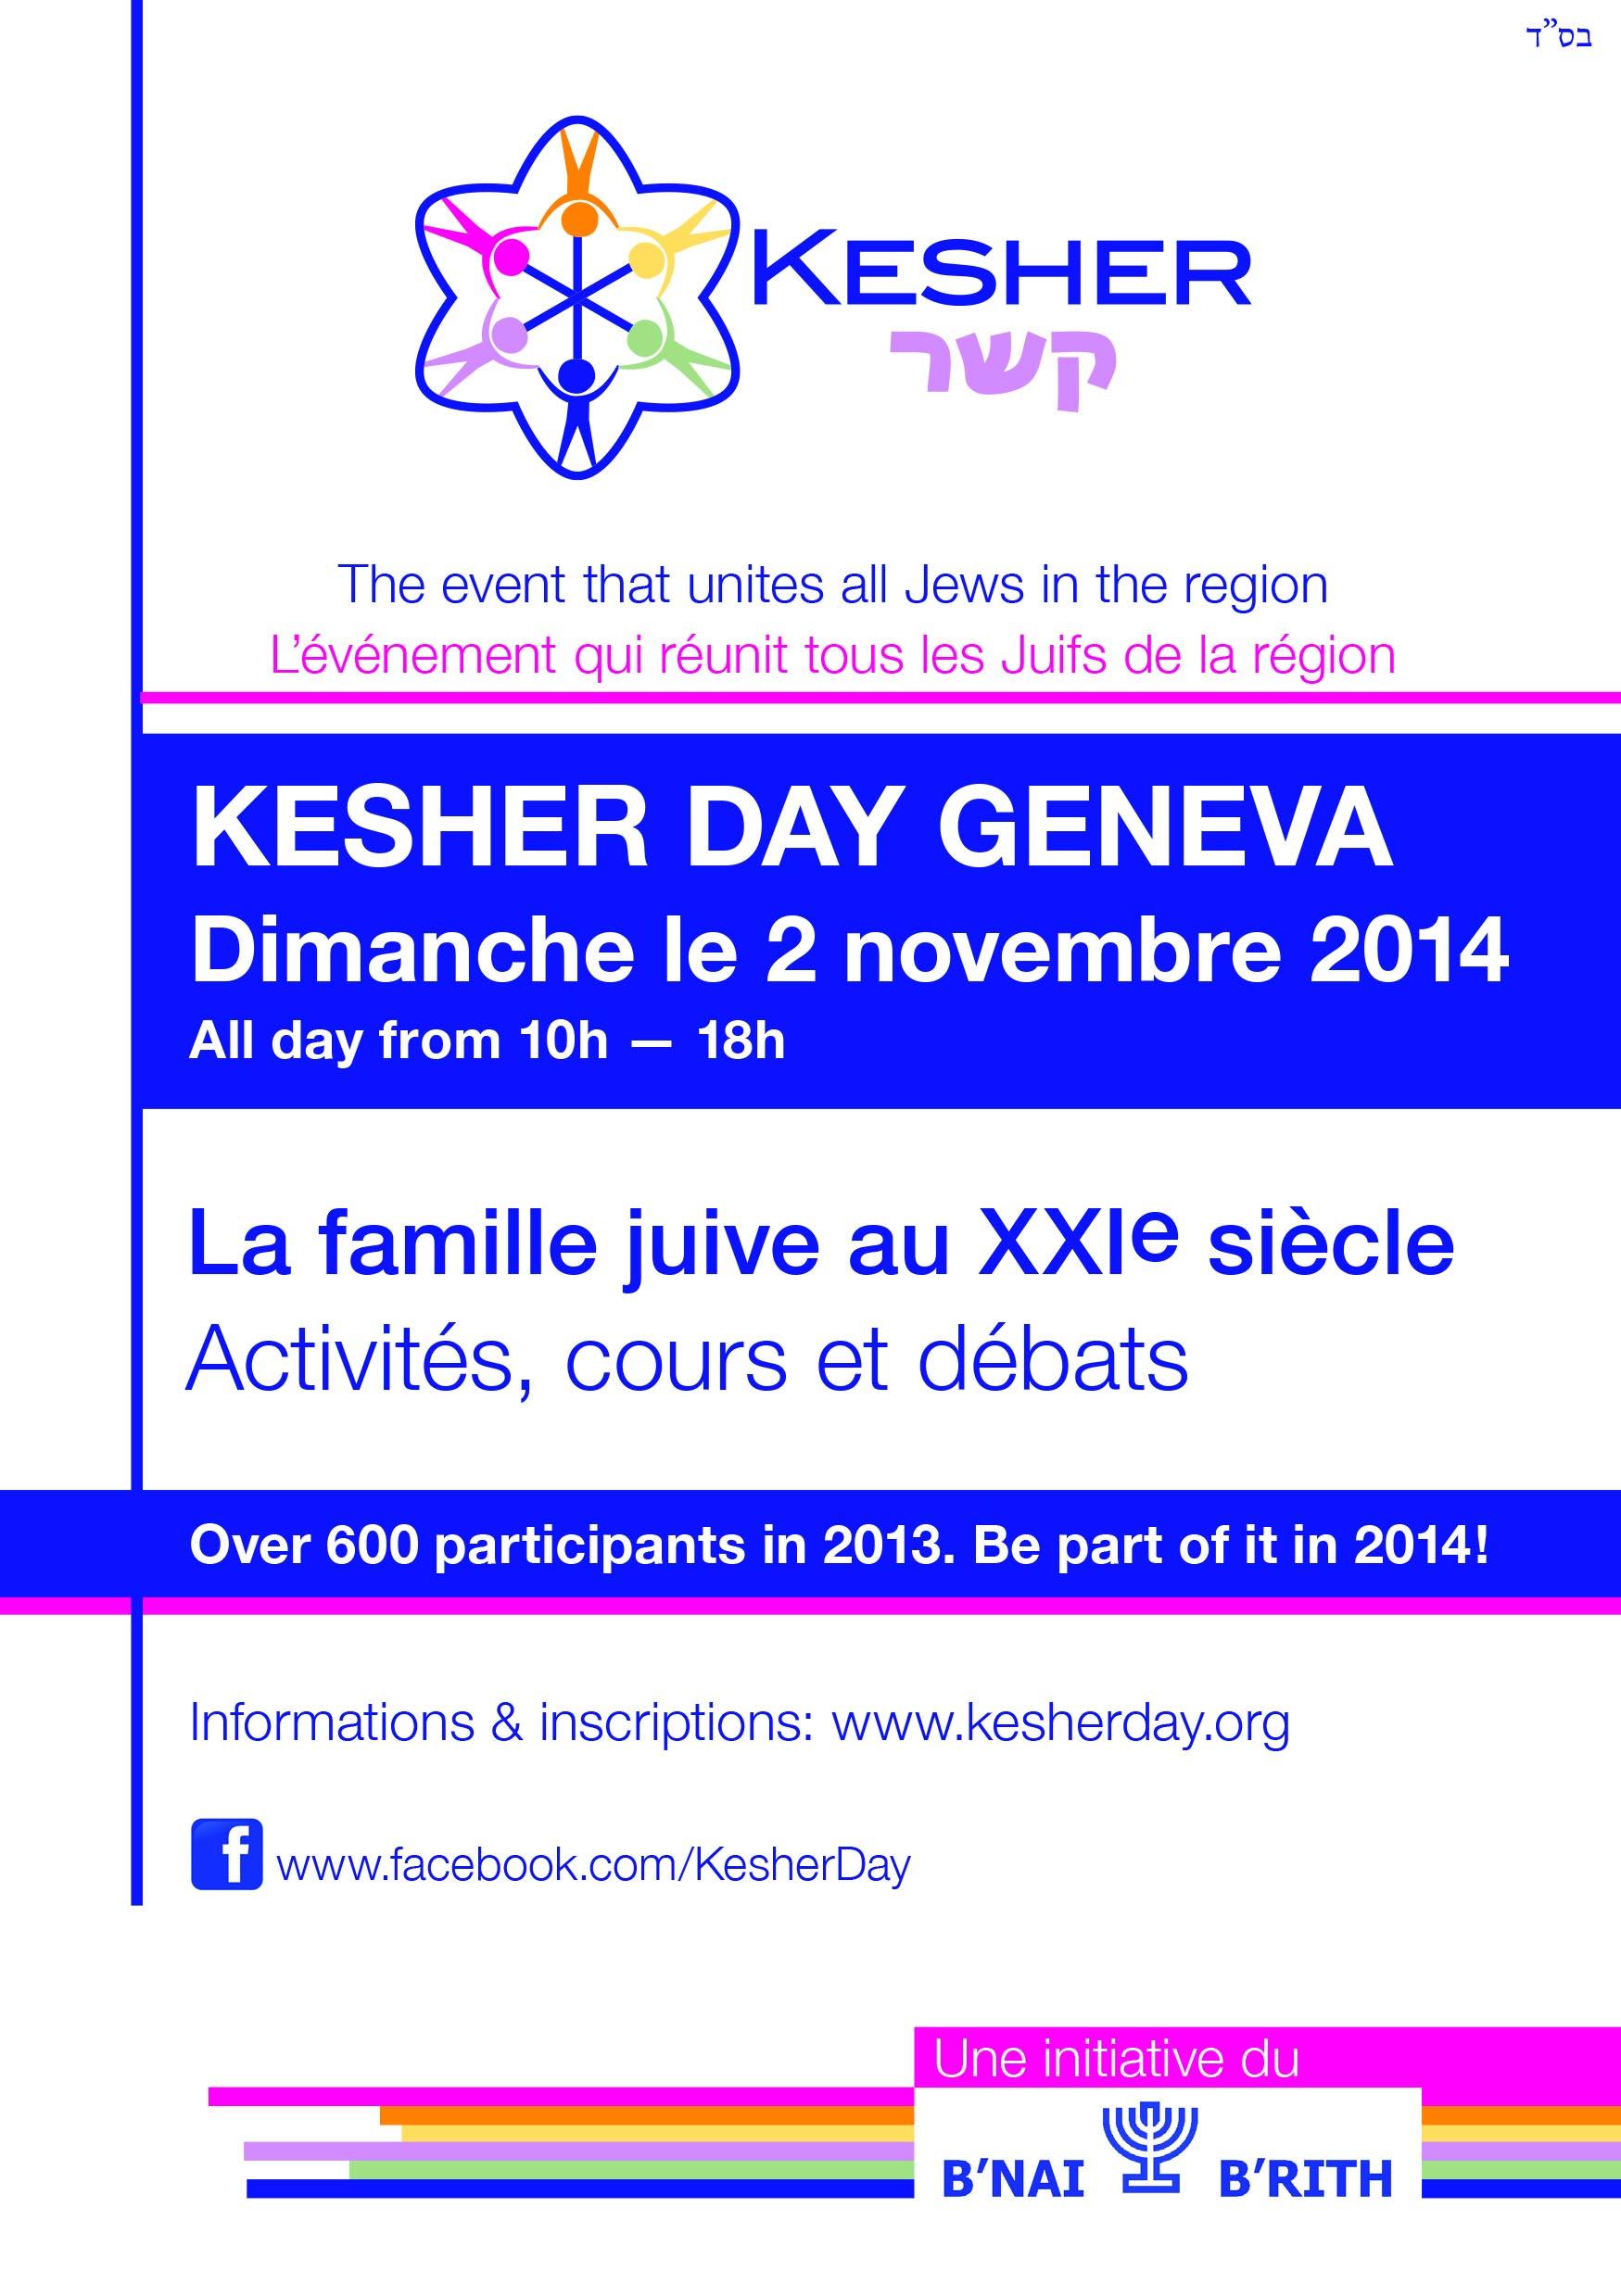 Kesher Day Geneva